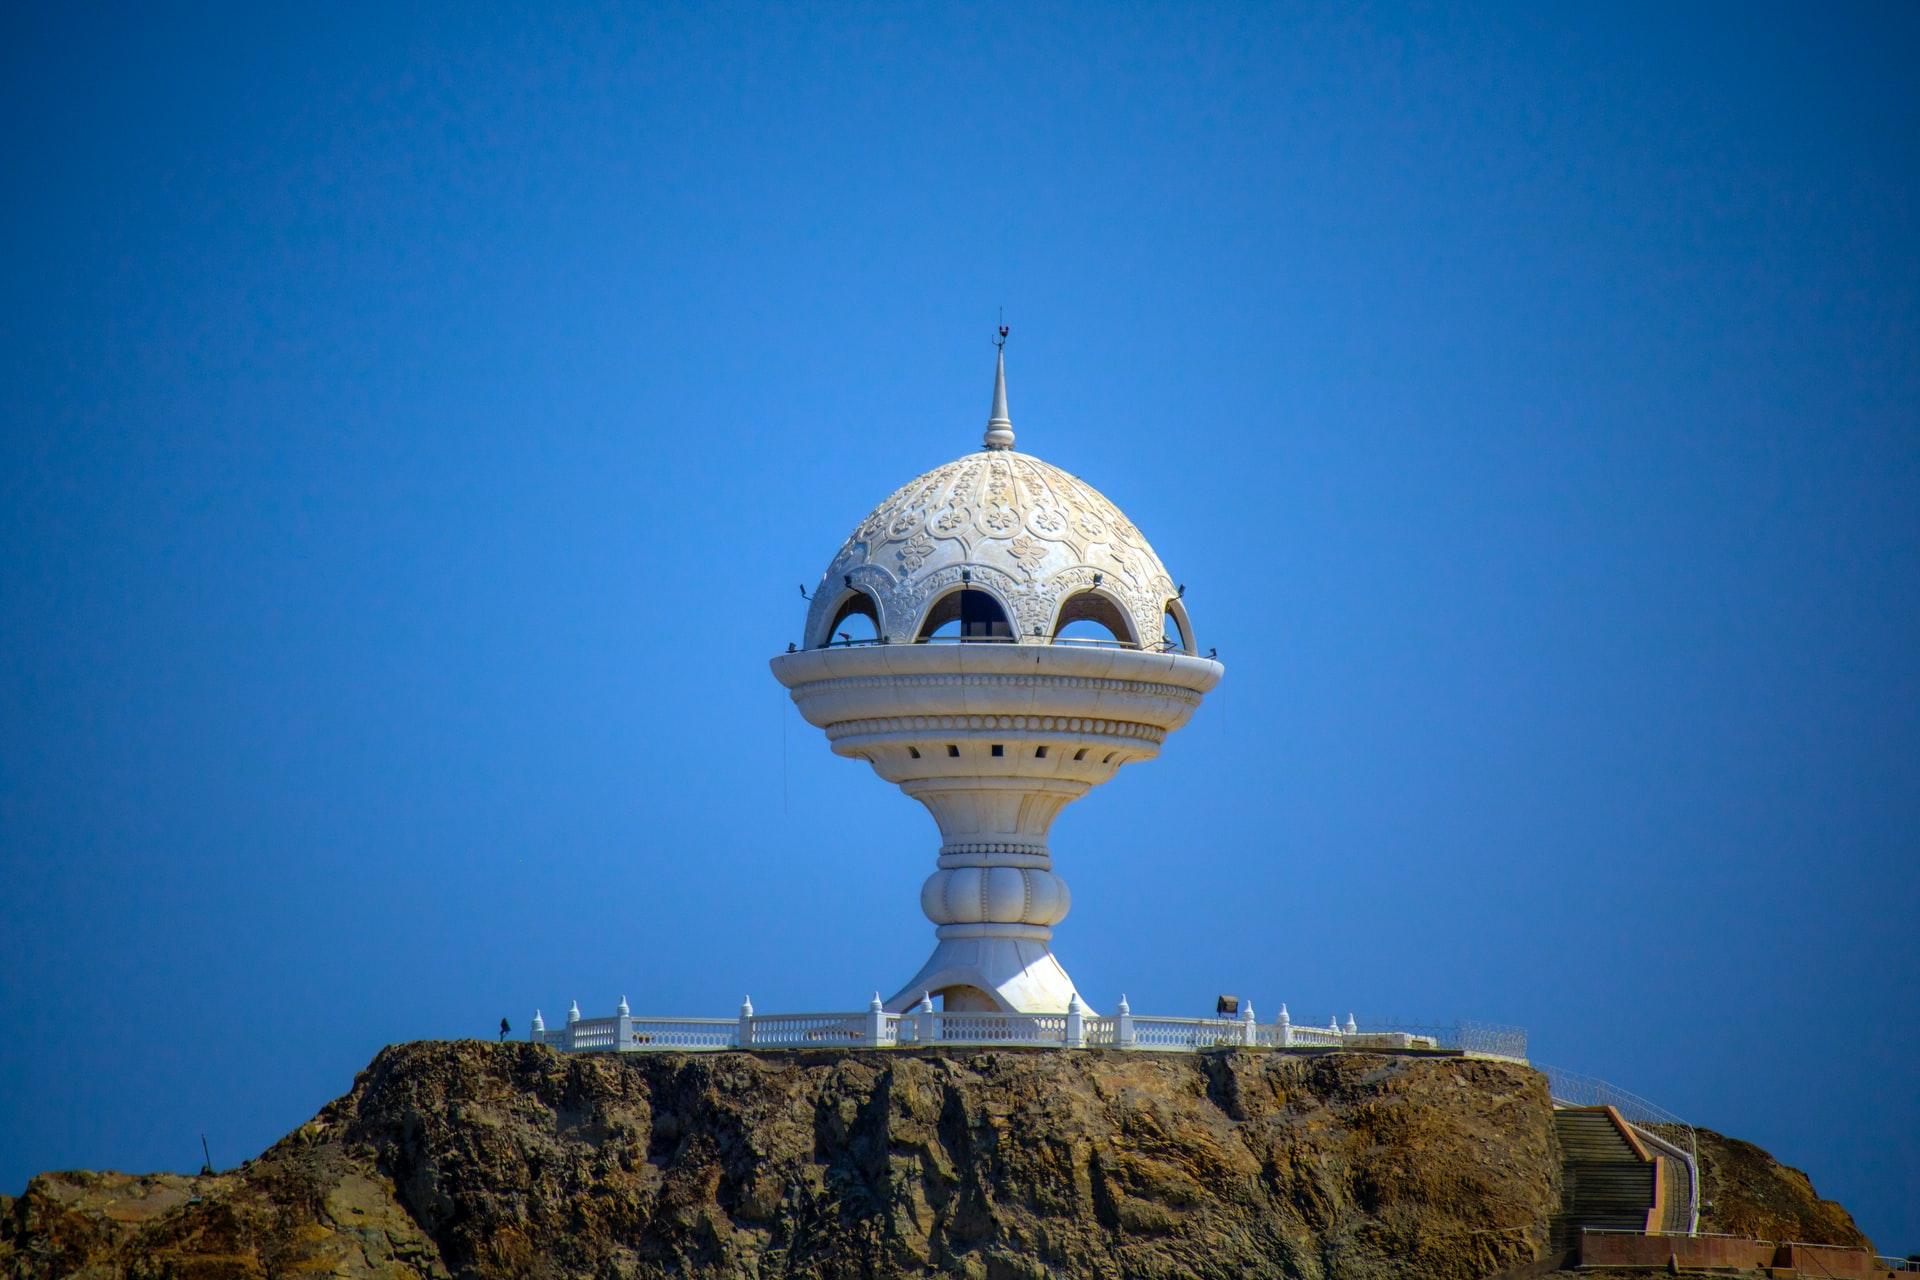 Muscat, Muttrah, Oman